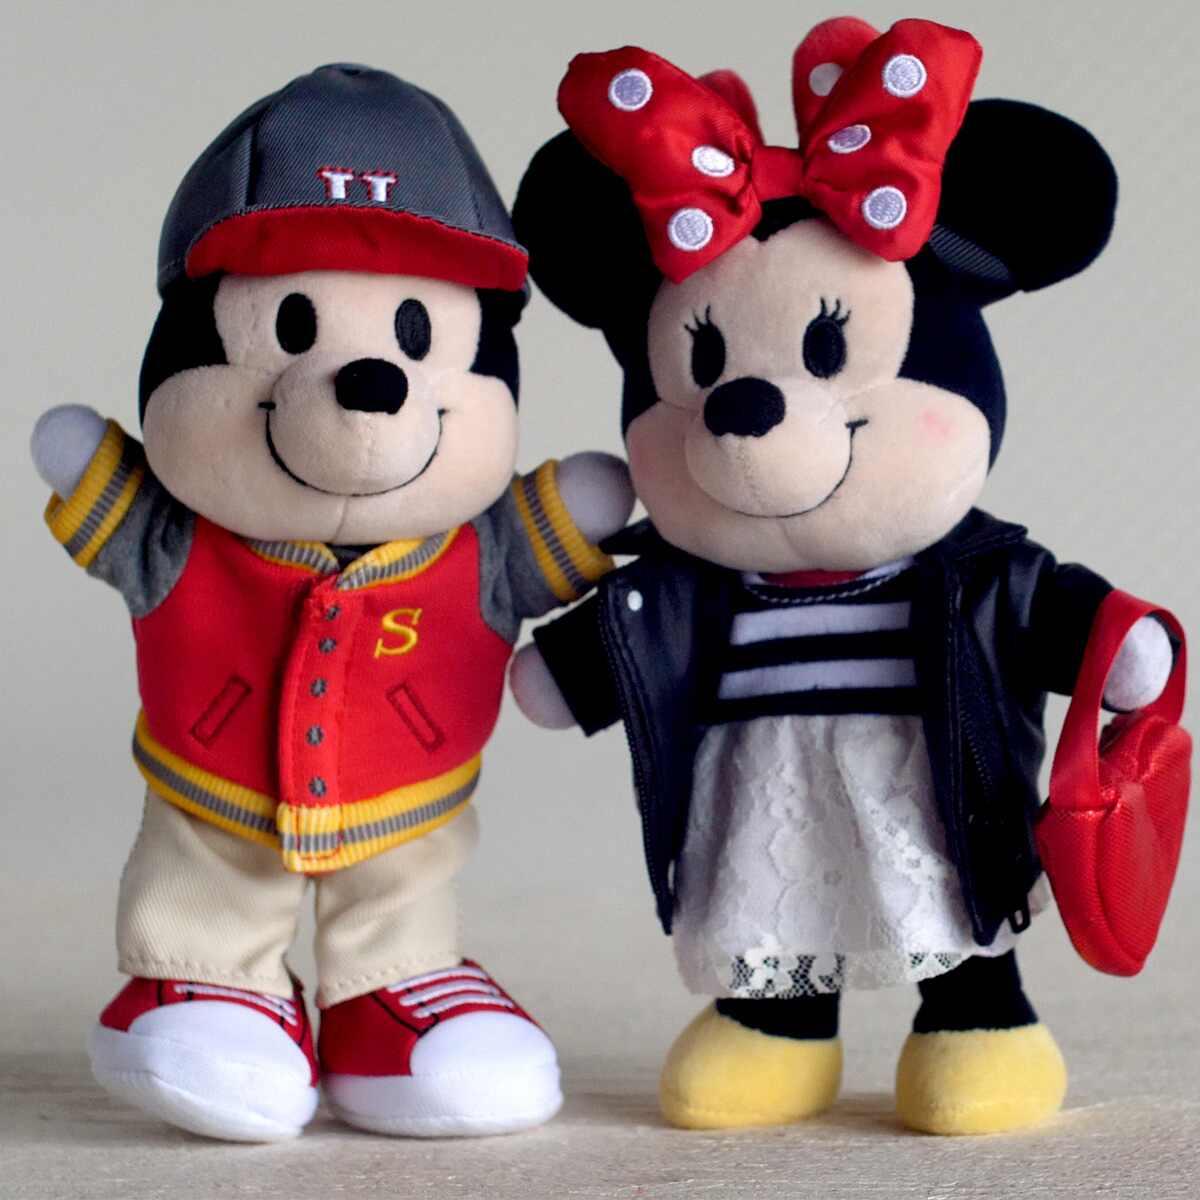 E-Comm: Disney NuiMo Launch